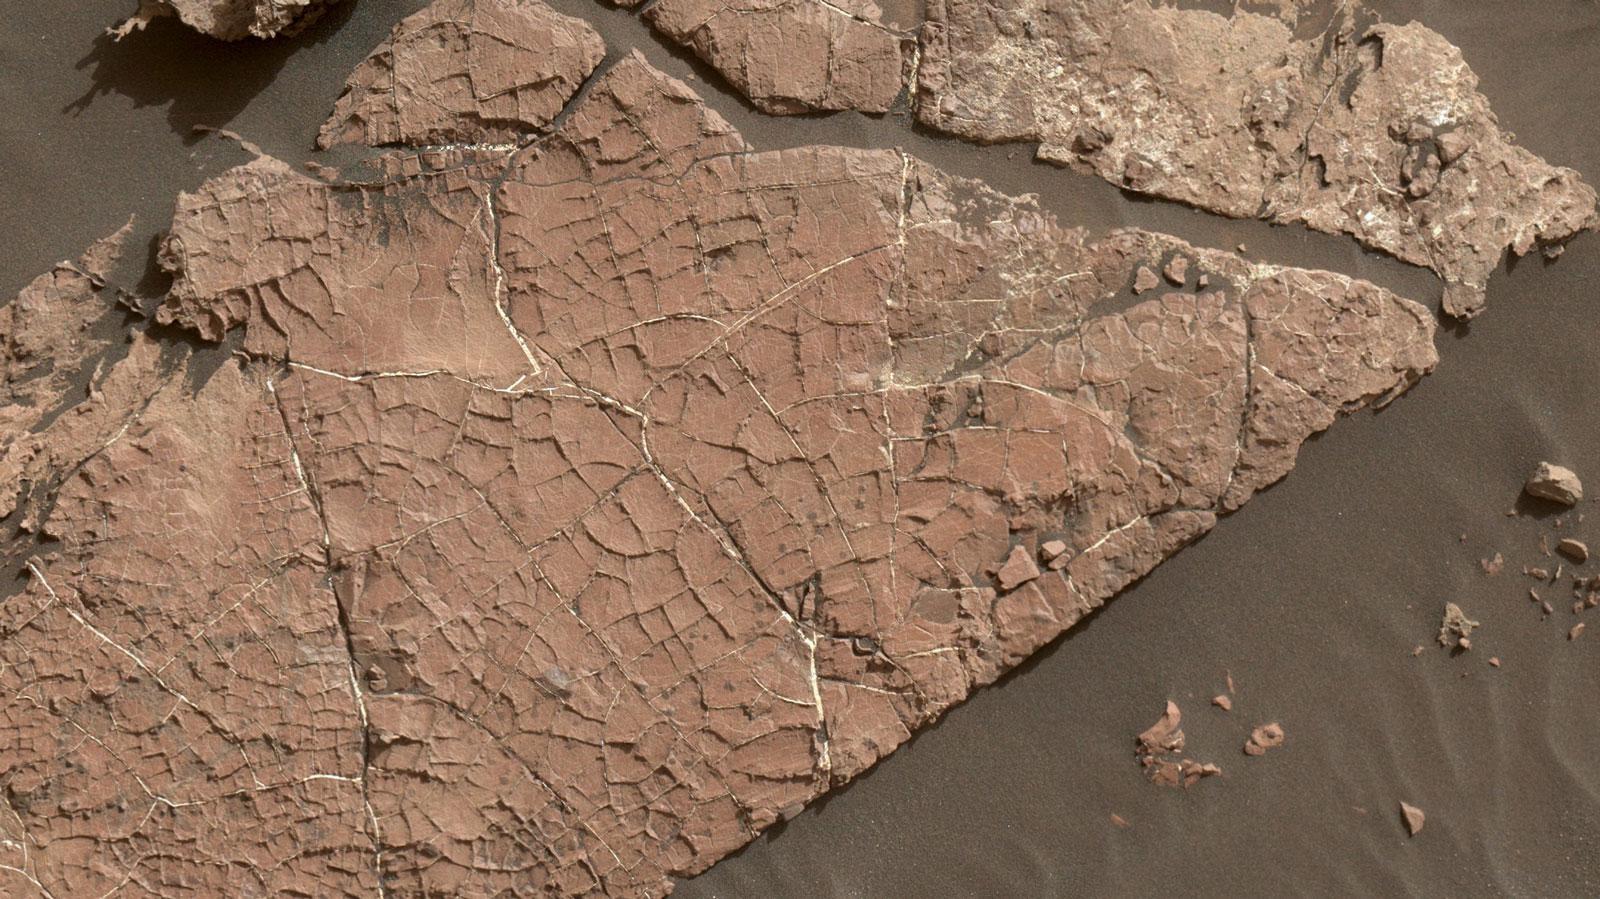 Curiosity заглянул в прошлое озера на дне кратера Гейла